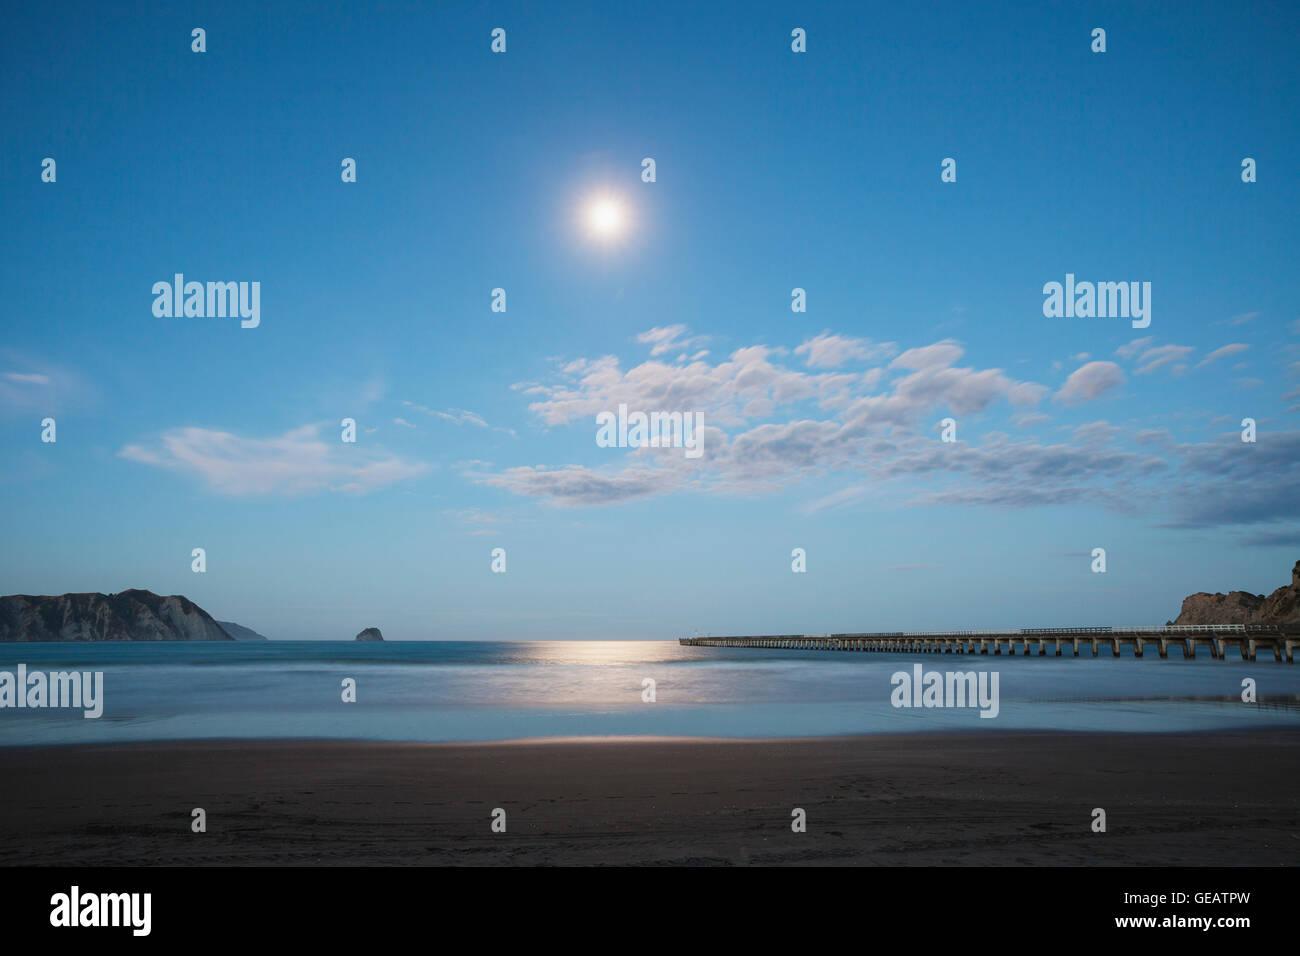 New Zealand, North Island, East Cape Region, Tolaga Bay, full moon, moonlight reflecting on ocean, South Pacific, - Stock Image